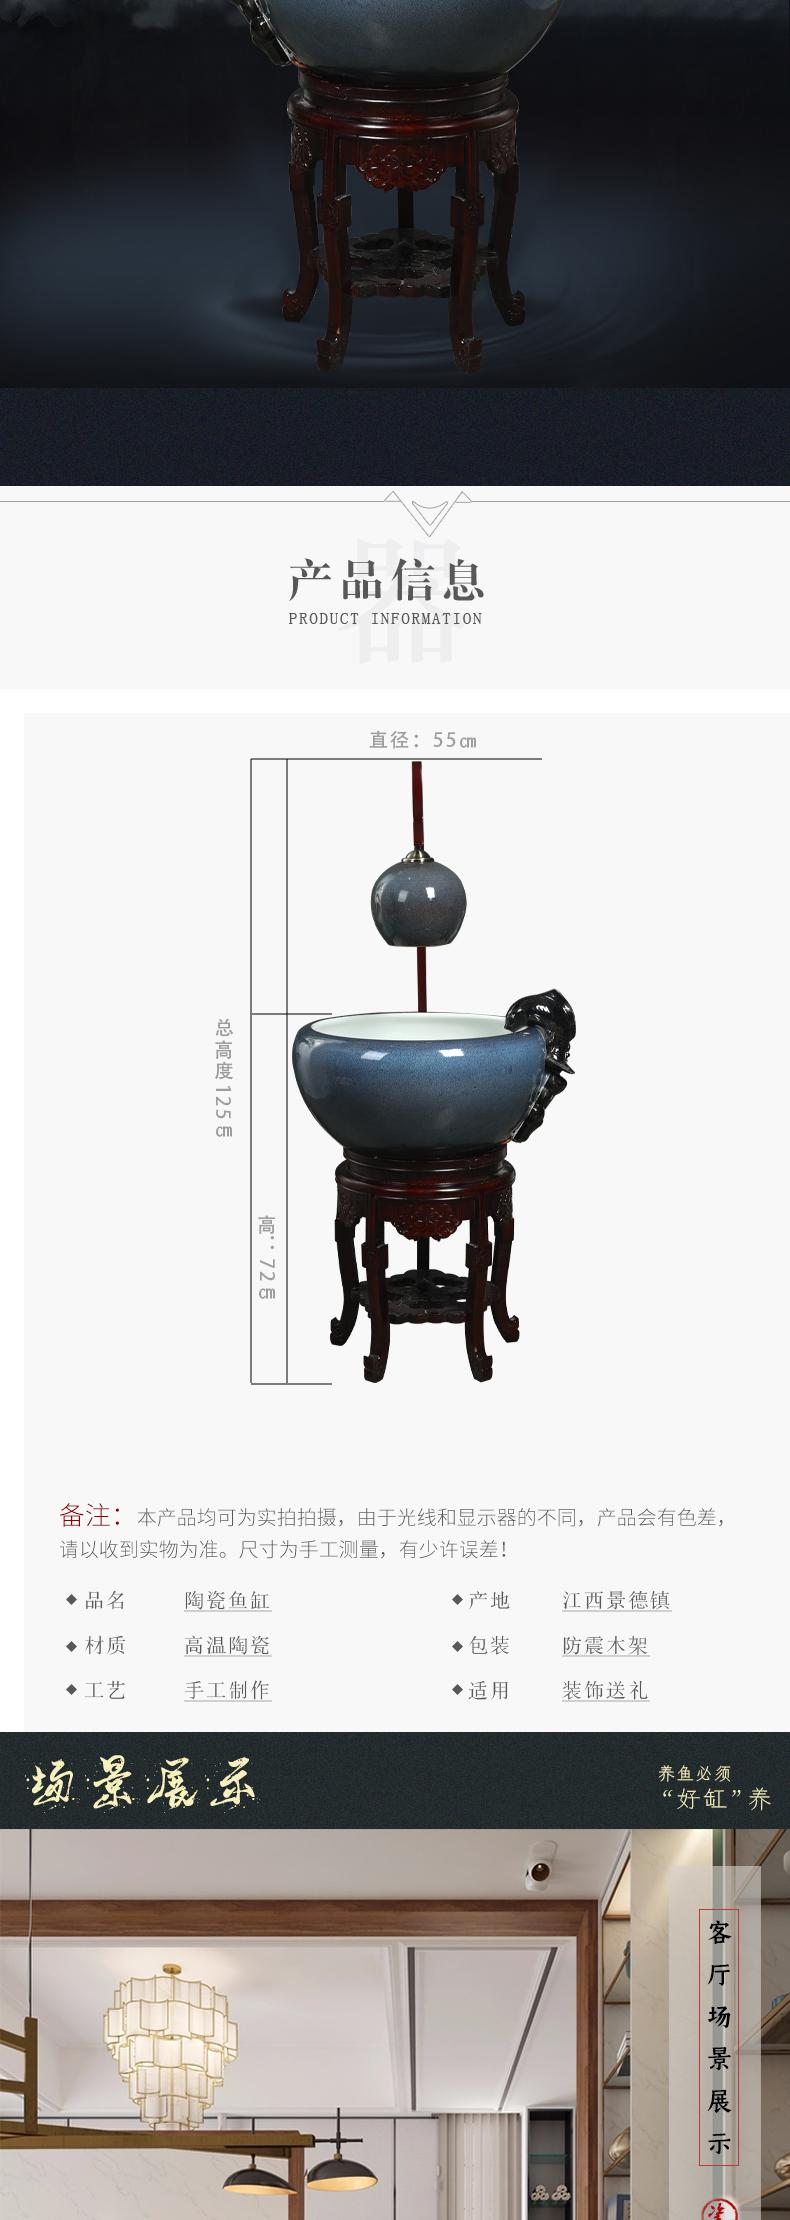 Jingdezhen ceramic aquarium tank circulation water filters turtle sitting room home a goldfish bowl and oxygen cylinder